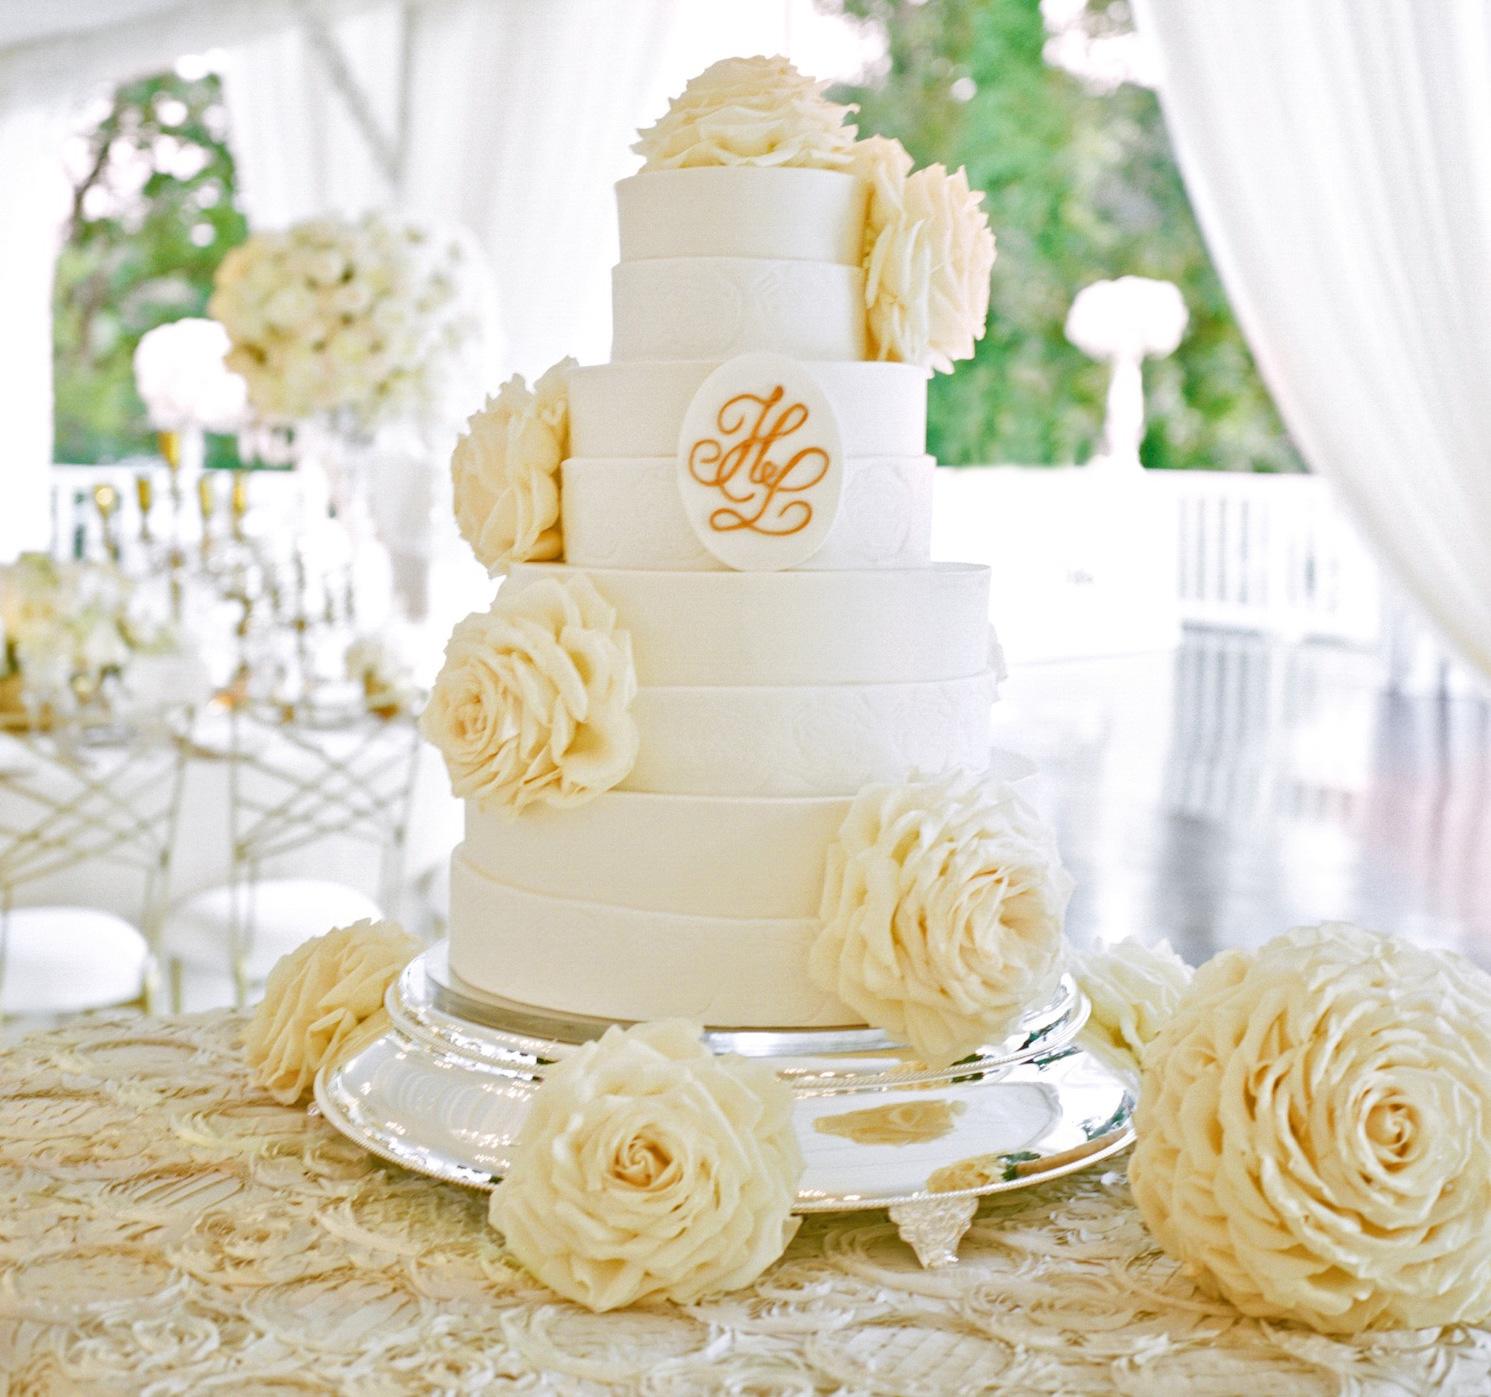 Wedding Cakes: 20 Ways to Decorate with Fresh Flowers - Inside Weddings